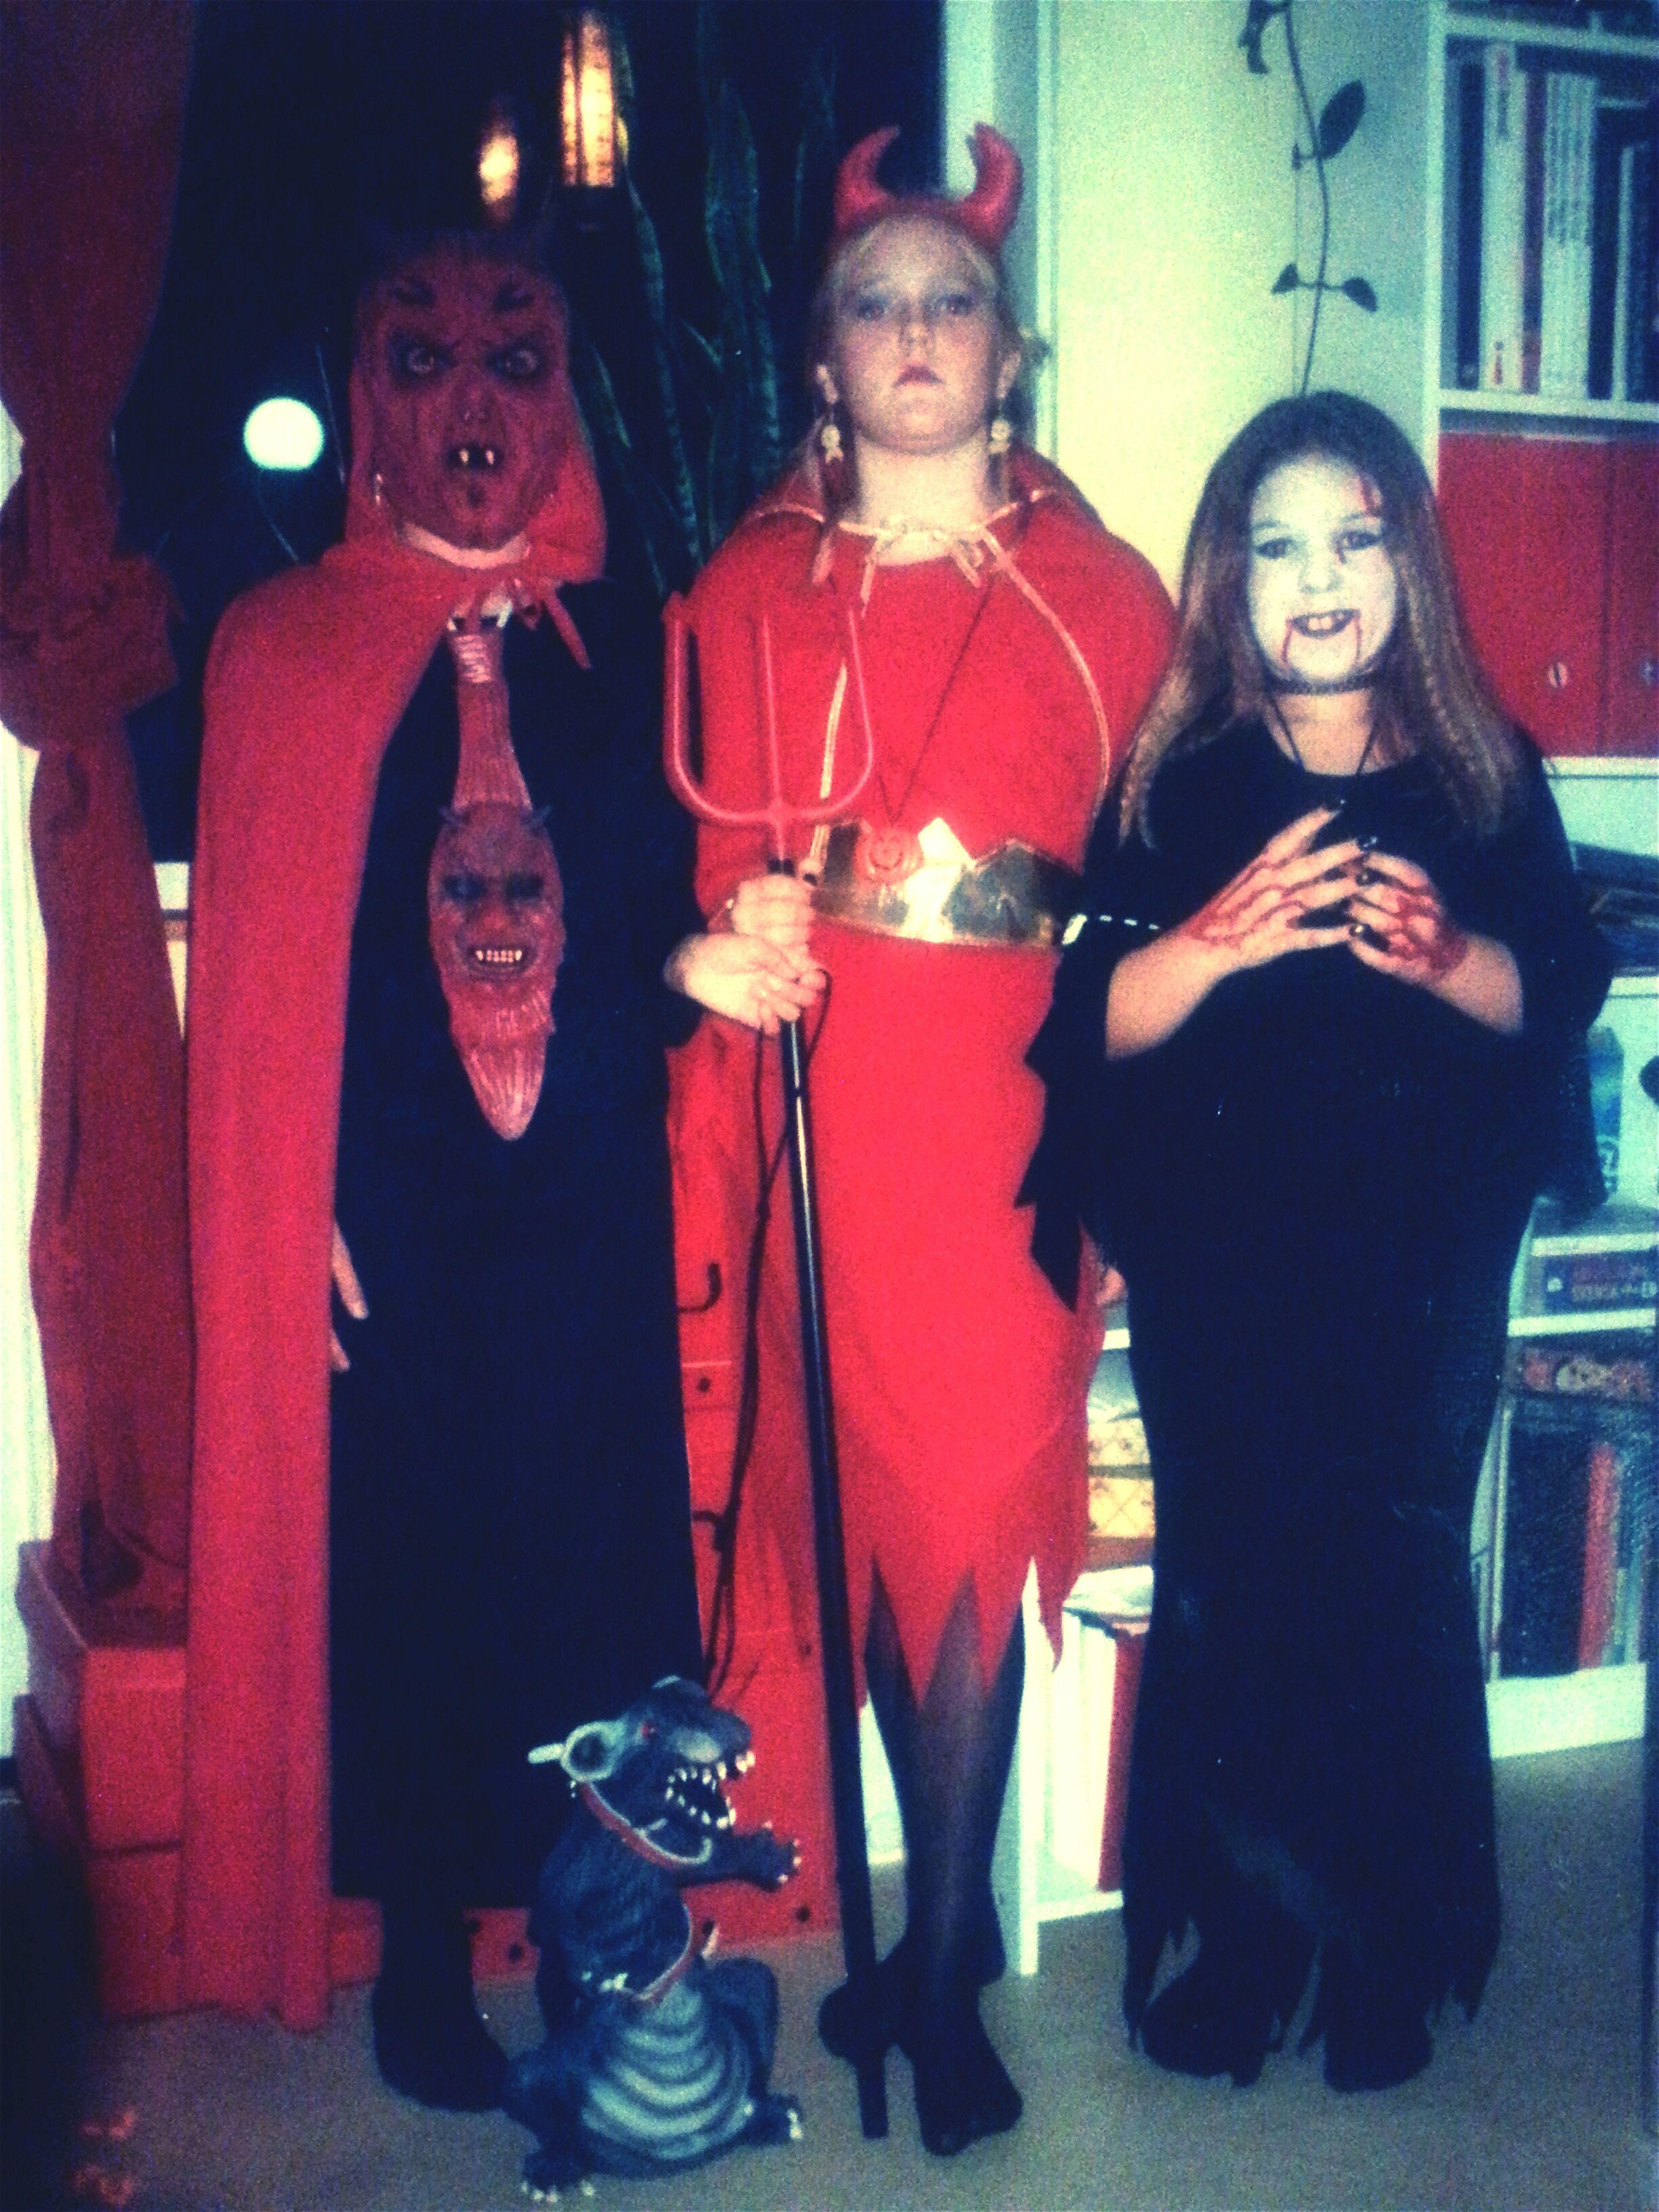 Happy Halloween Devilish Children With Rat-pet Halloweenparttime Three Little Devils Rat In A Leach